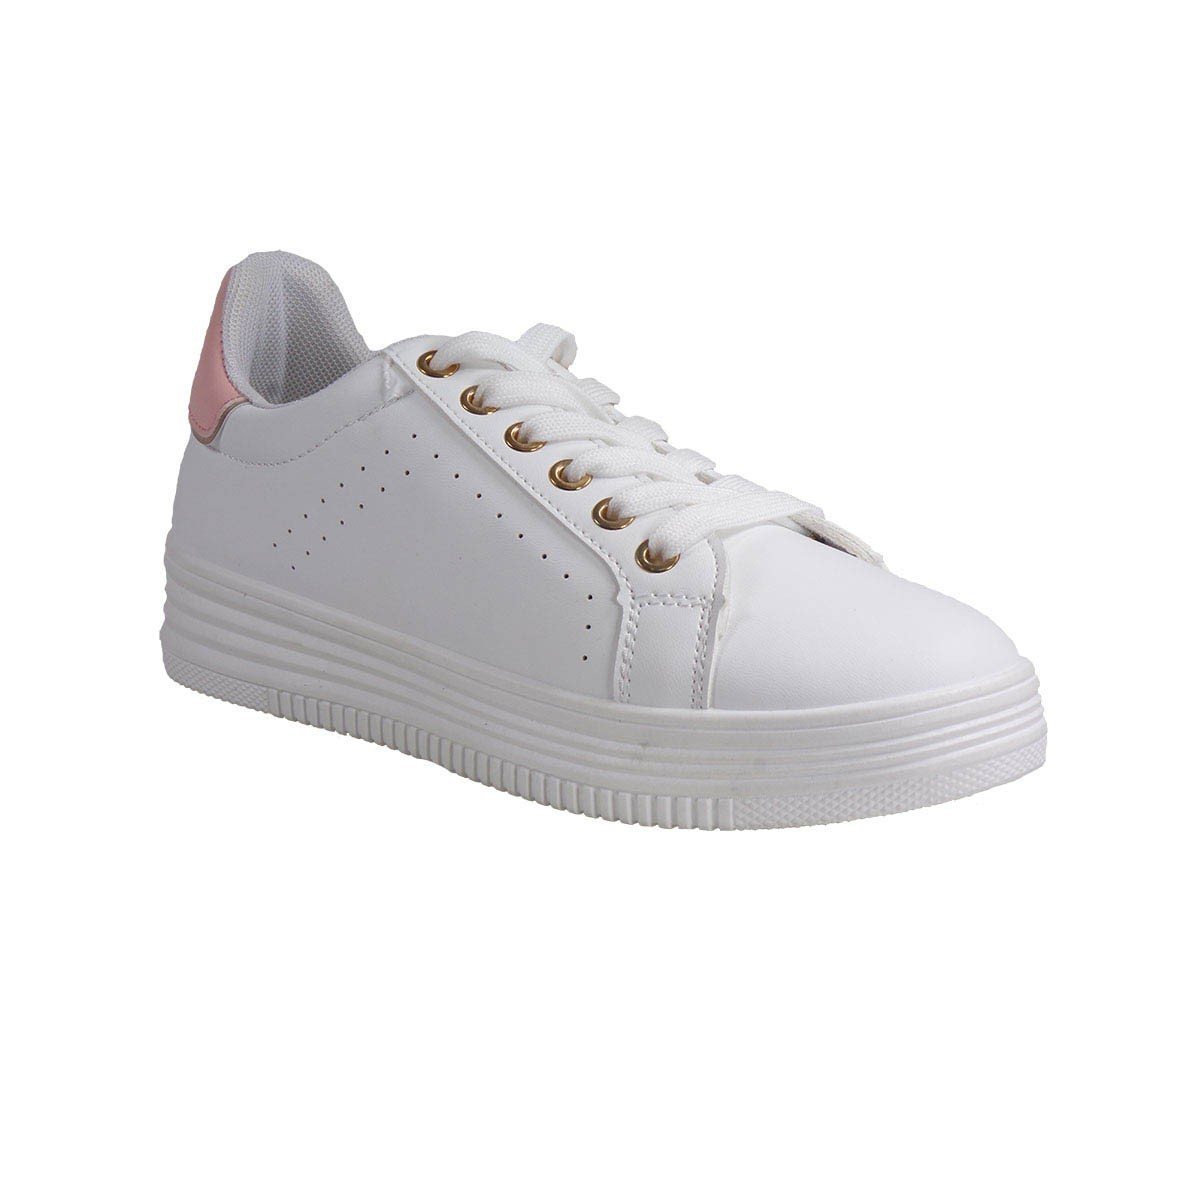 Bagiota Shoes Γυναικεία Παπούτσια Sneakers Αθλητικά ML-4303 Άσπρο-Ροζ